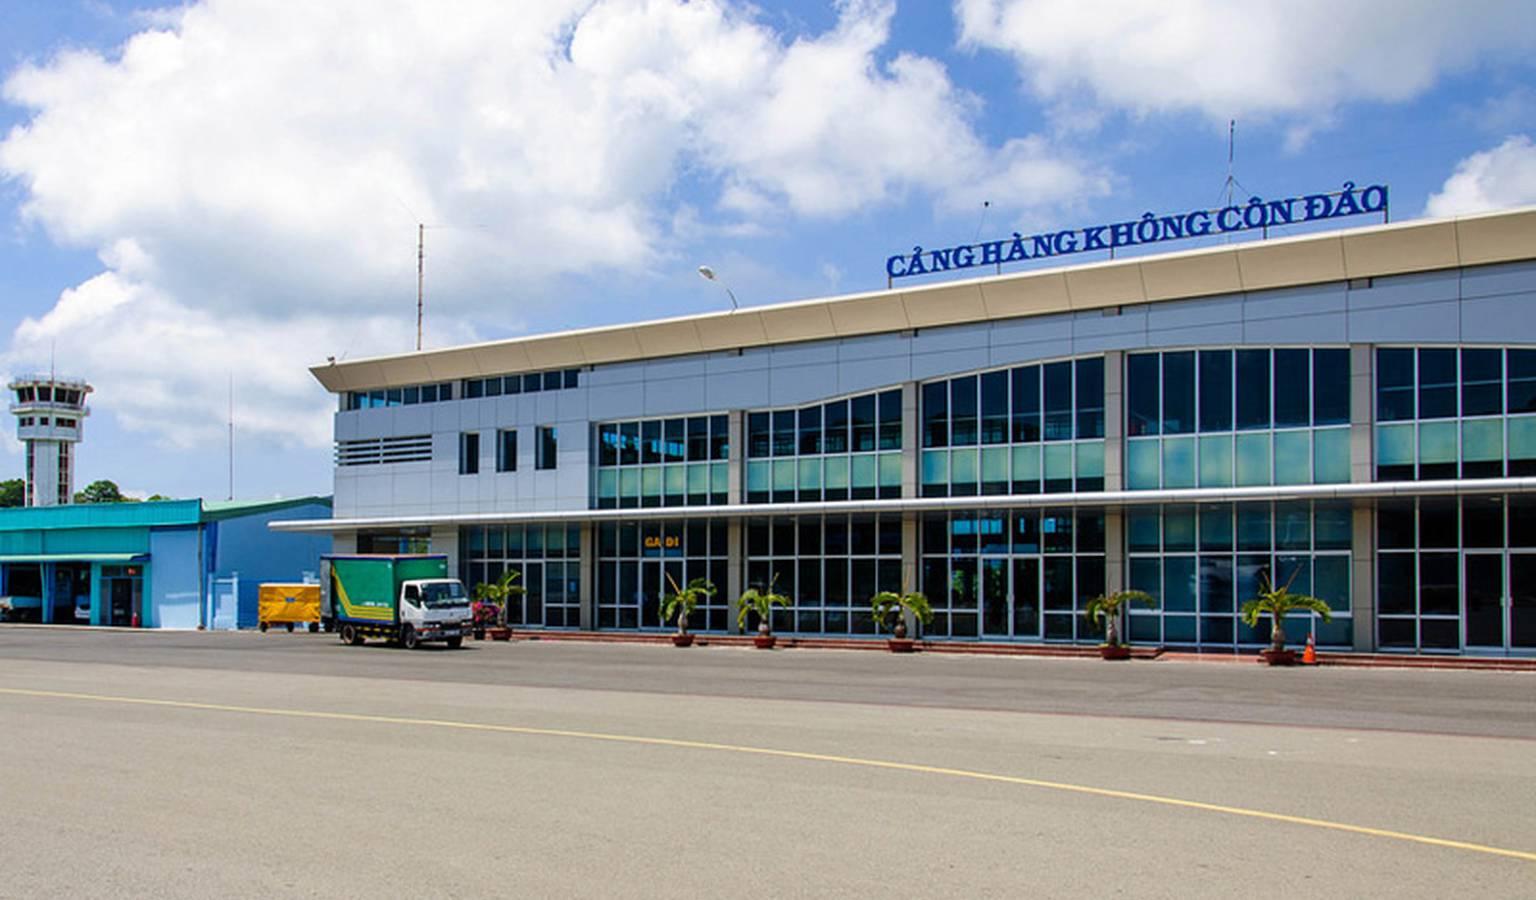 Sân bay Côn Đảo (Côn Đảo)